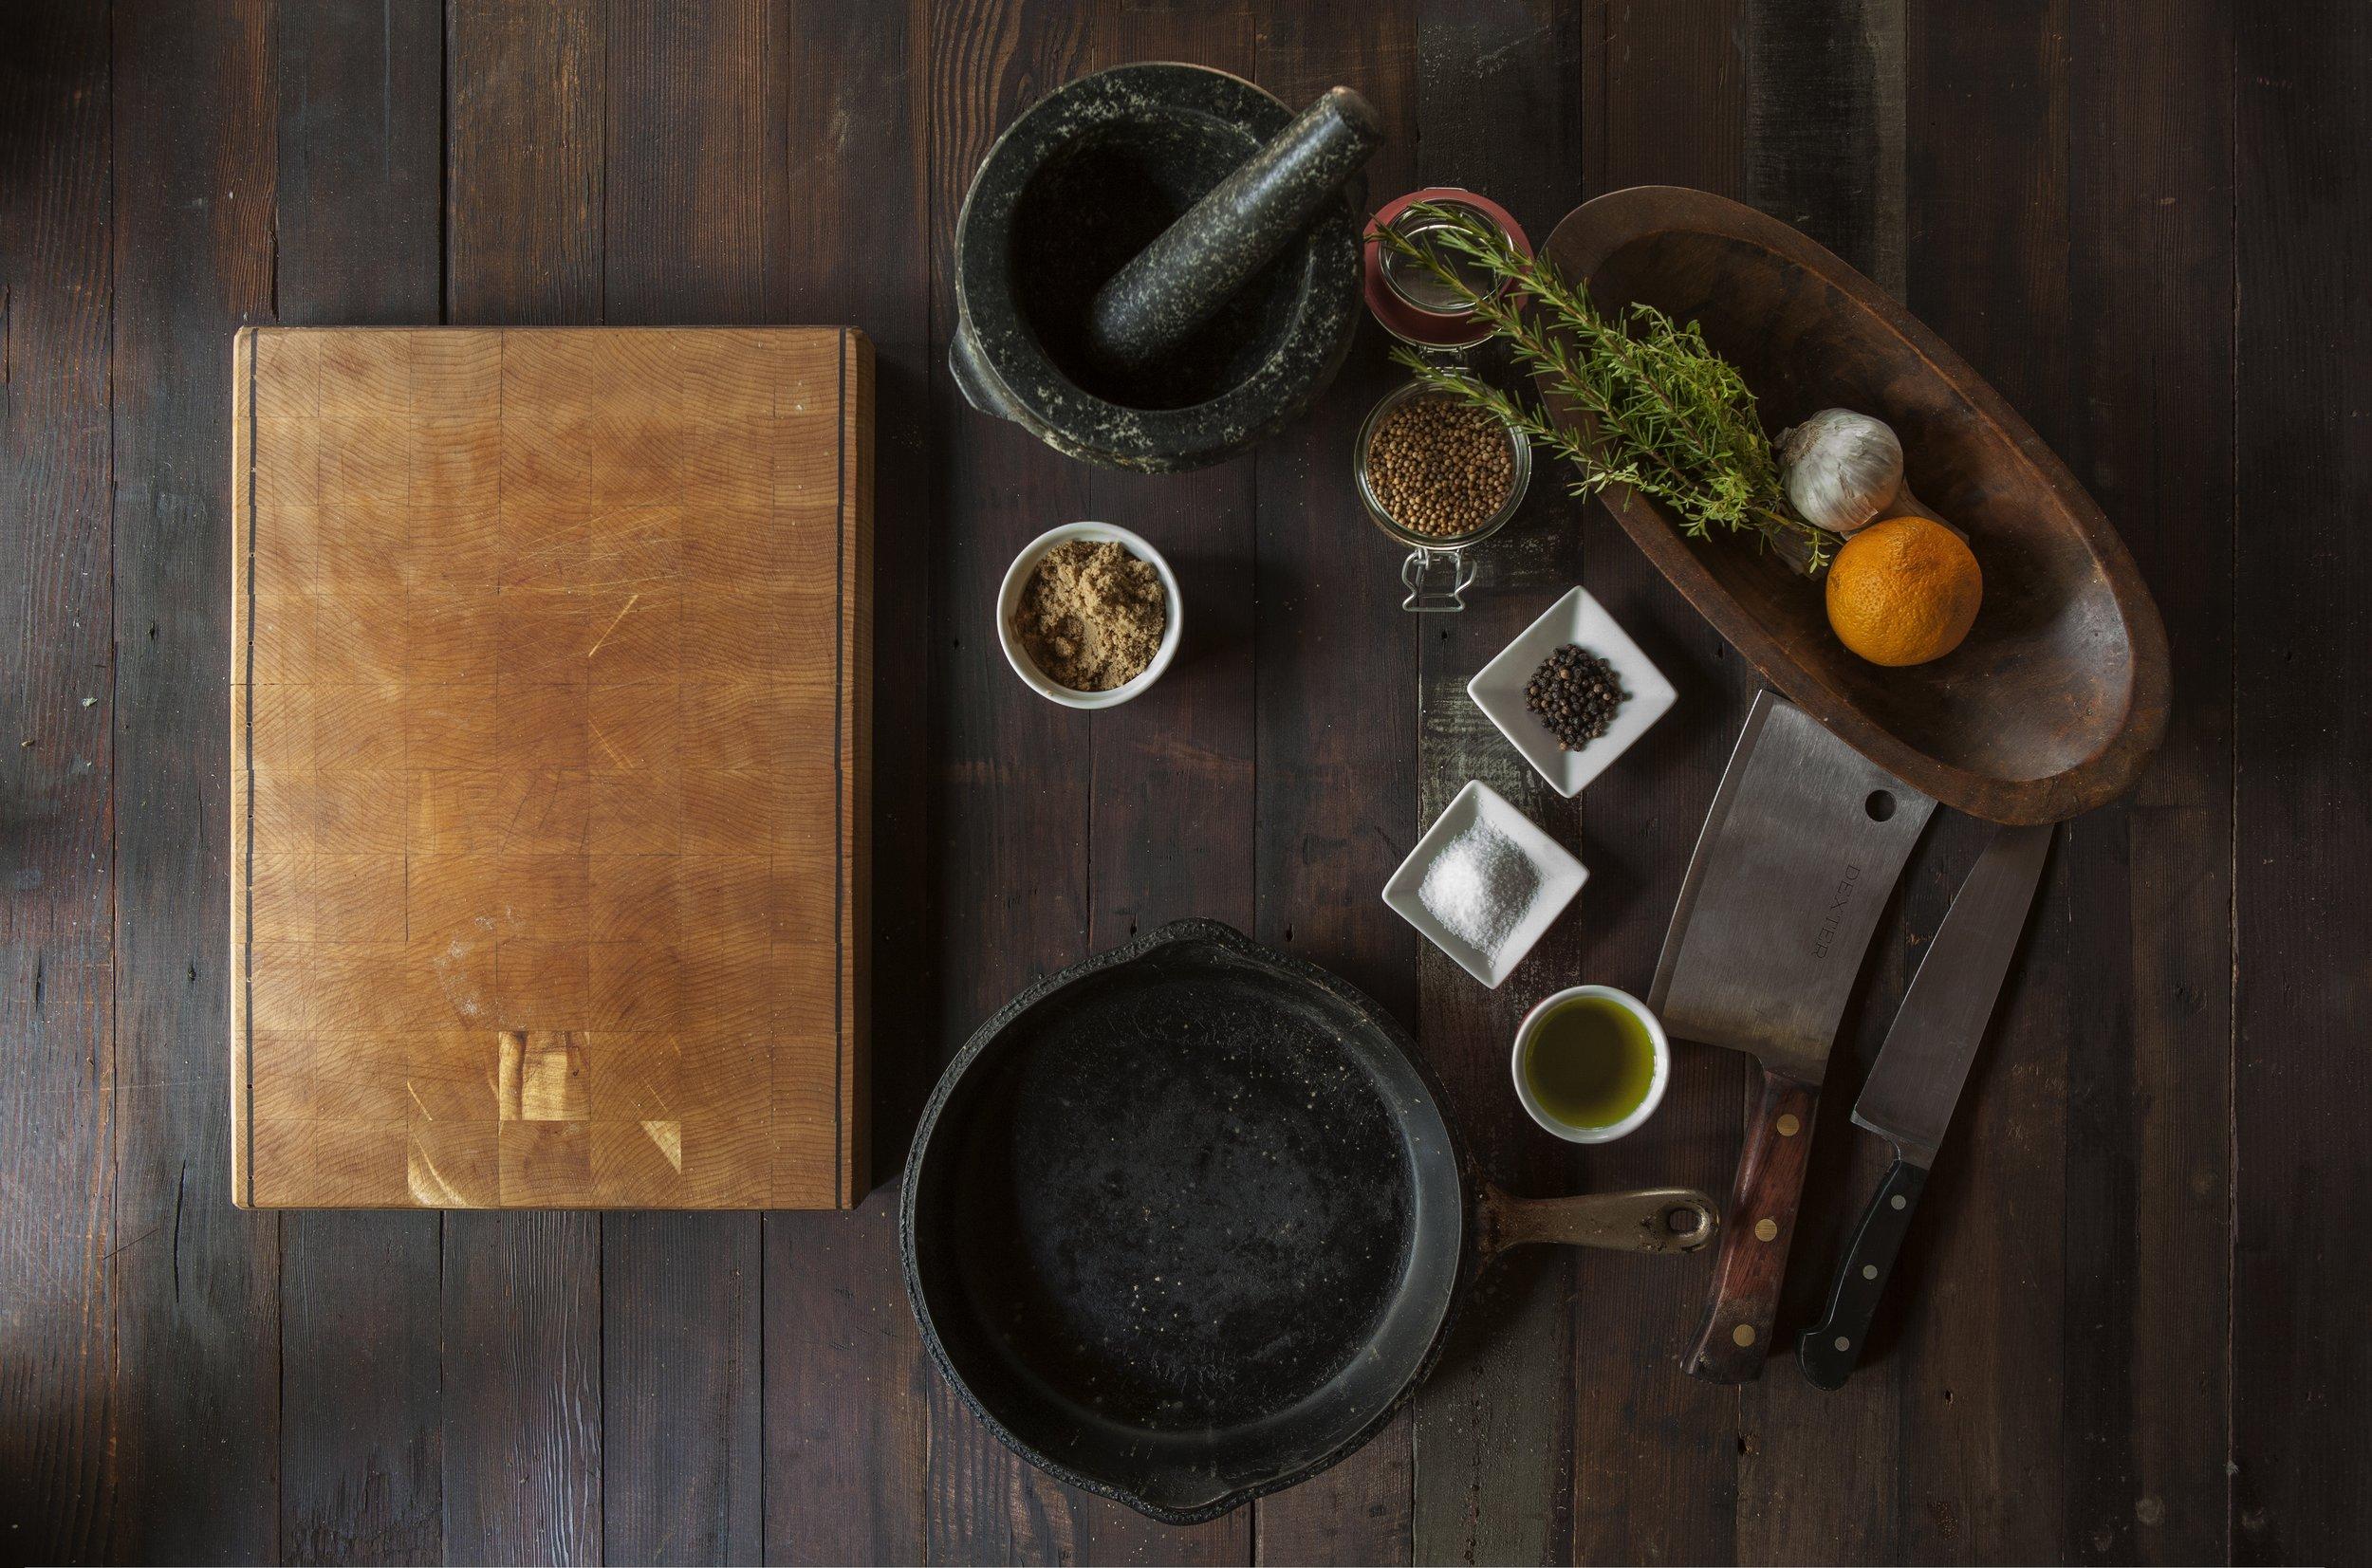 cast iron with cutting board.jpg